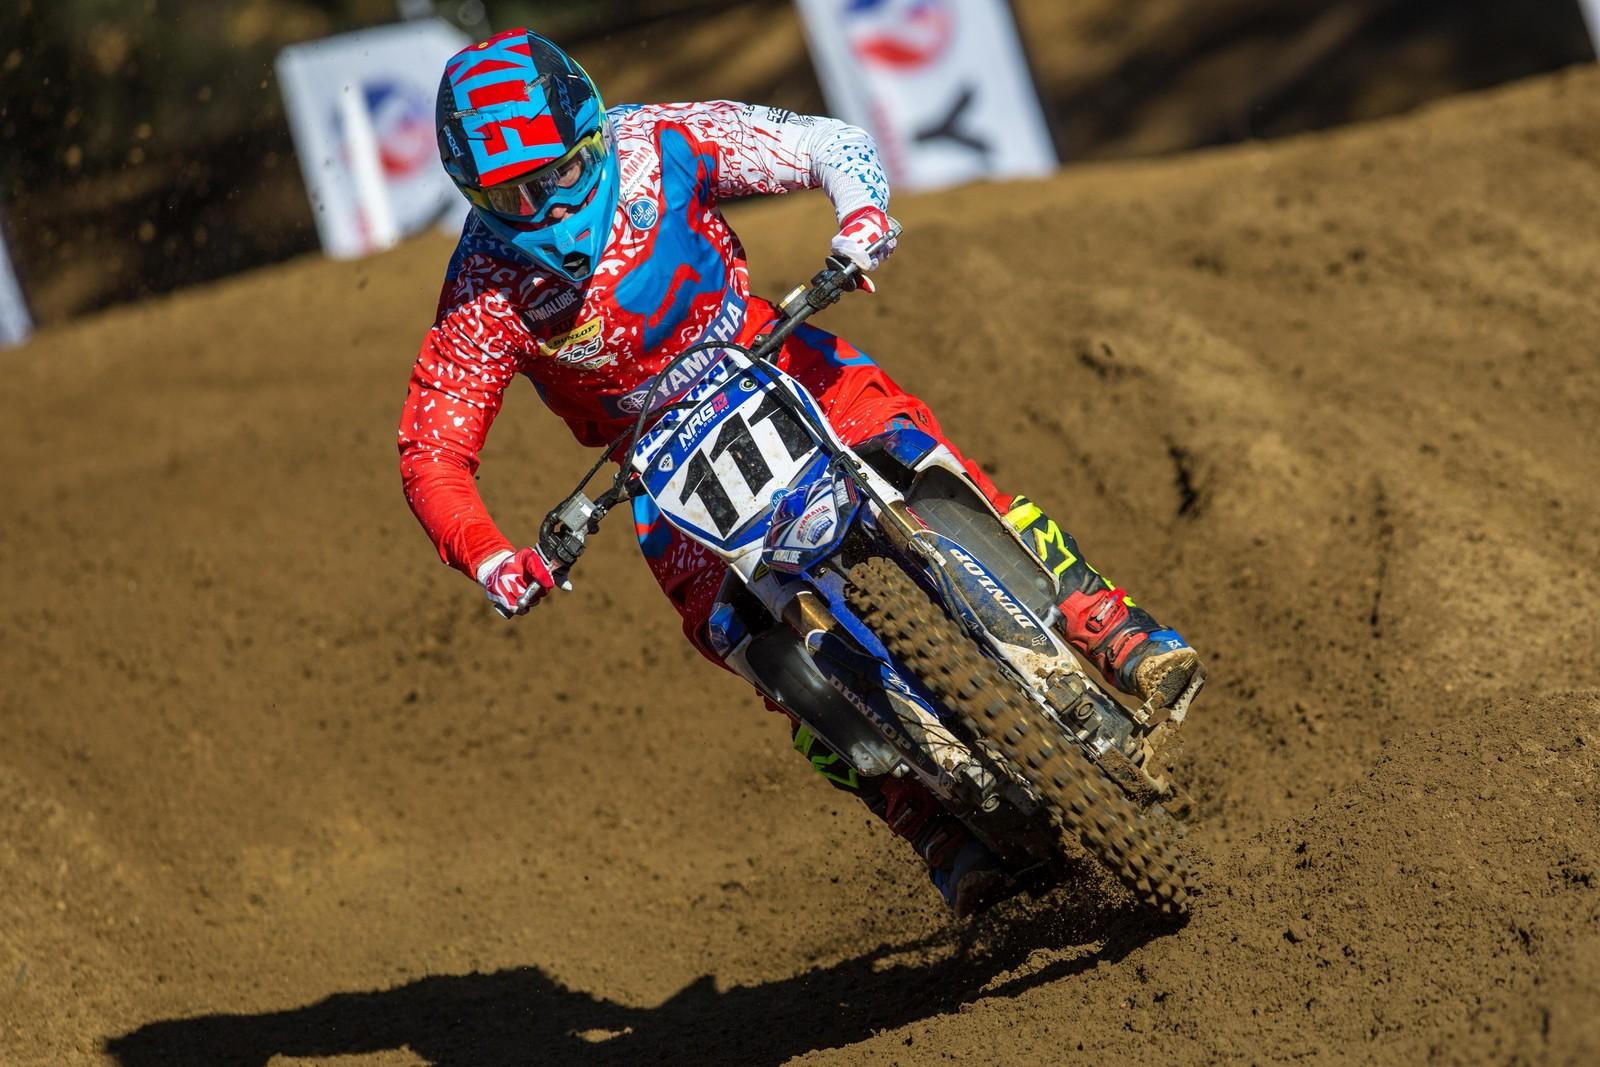 Dean Ferris - Australian Motul MX Championships: Round 6, Nowra - Motocross Pictures - Vital MX